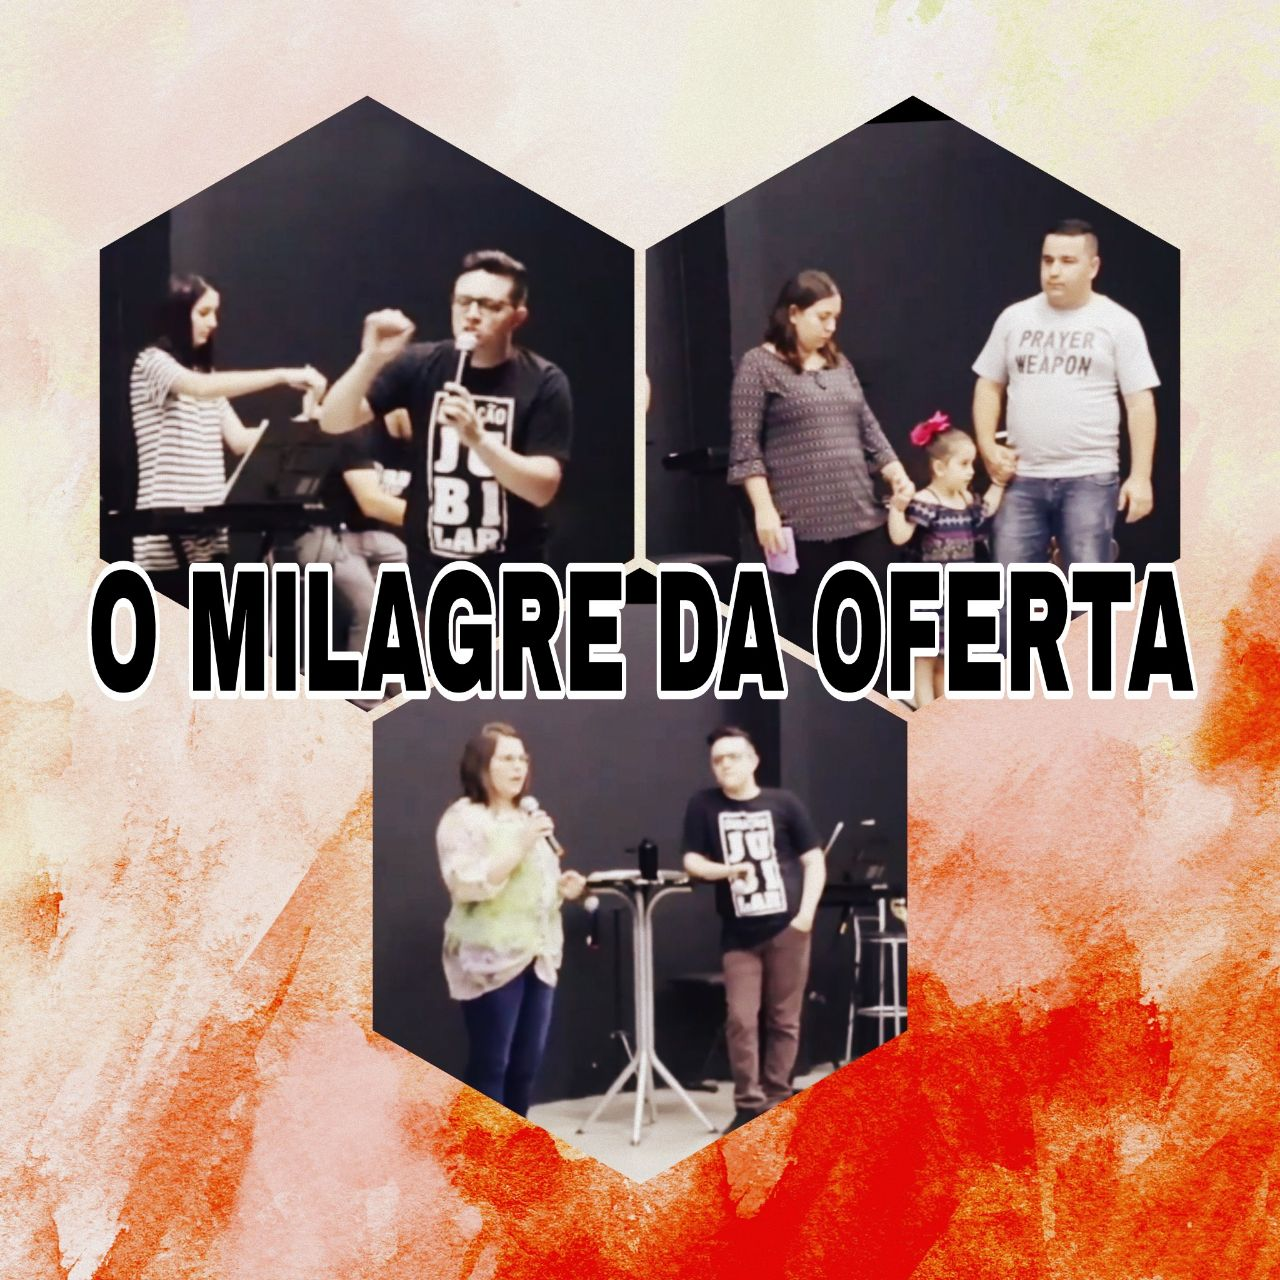 O MILAGRE DA OFERTA - TESTEMUNHOS